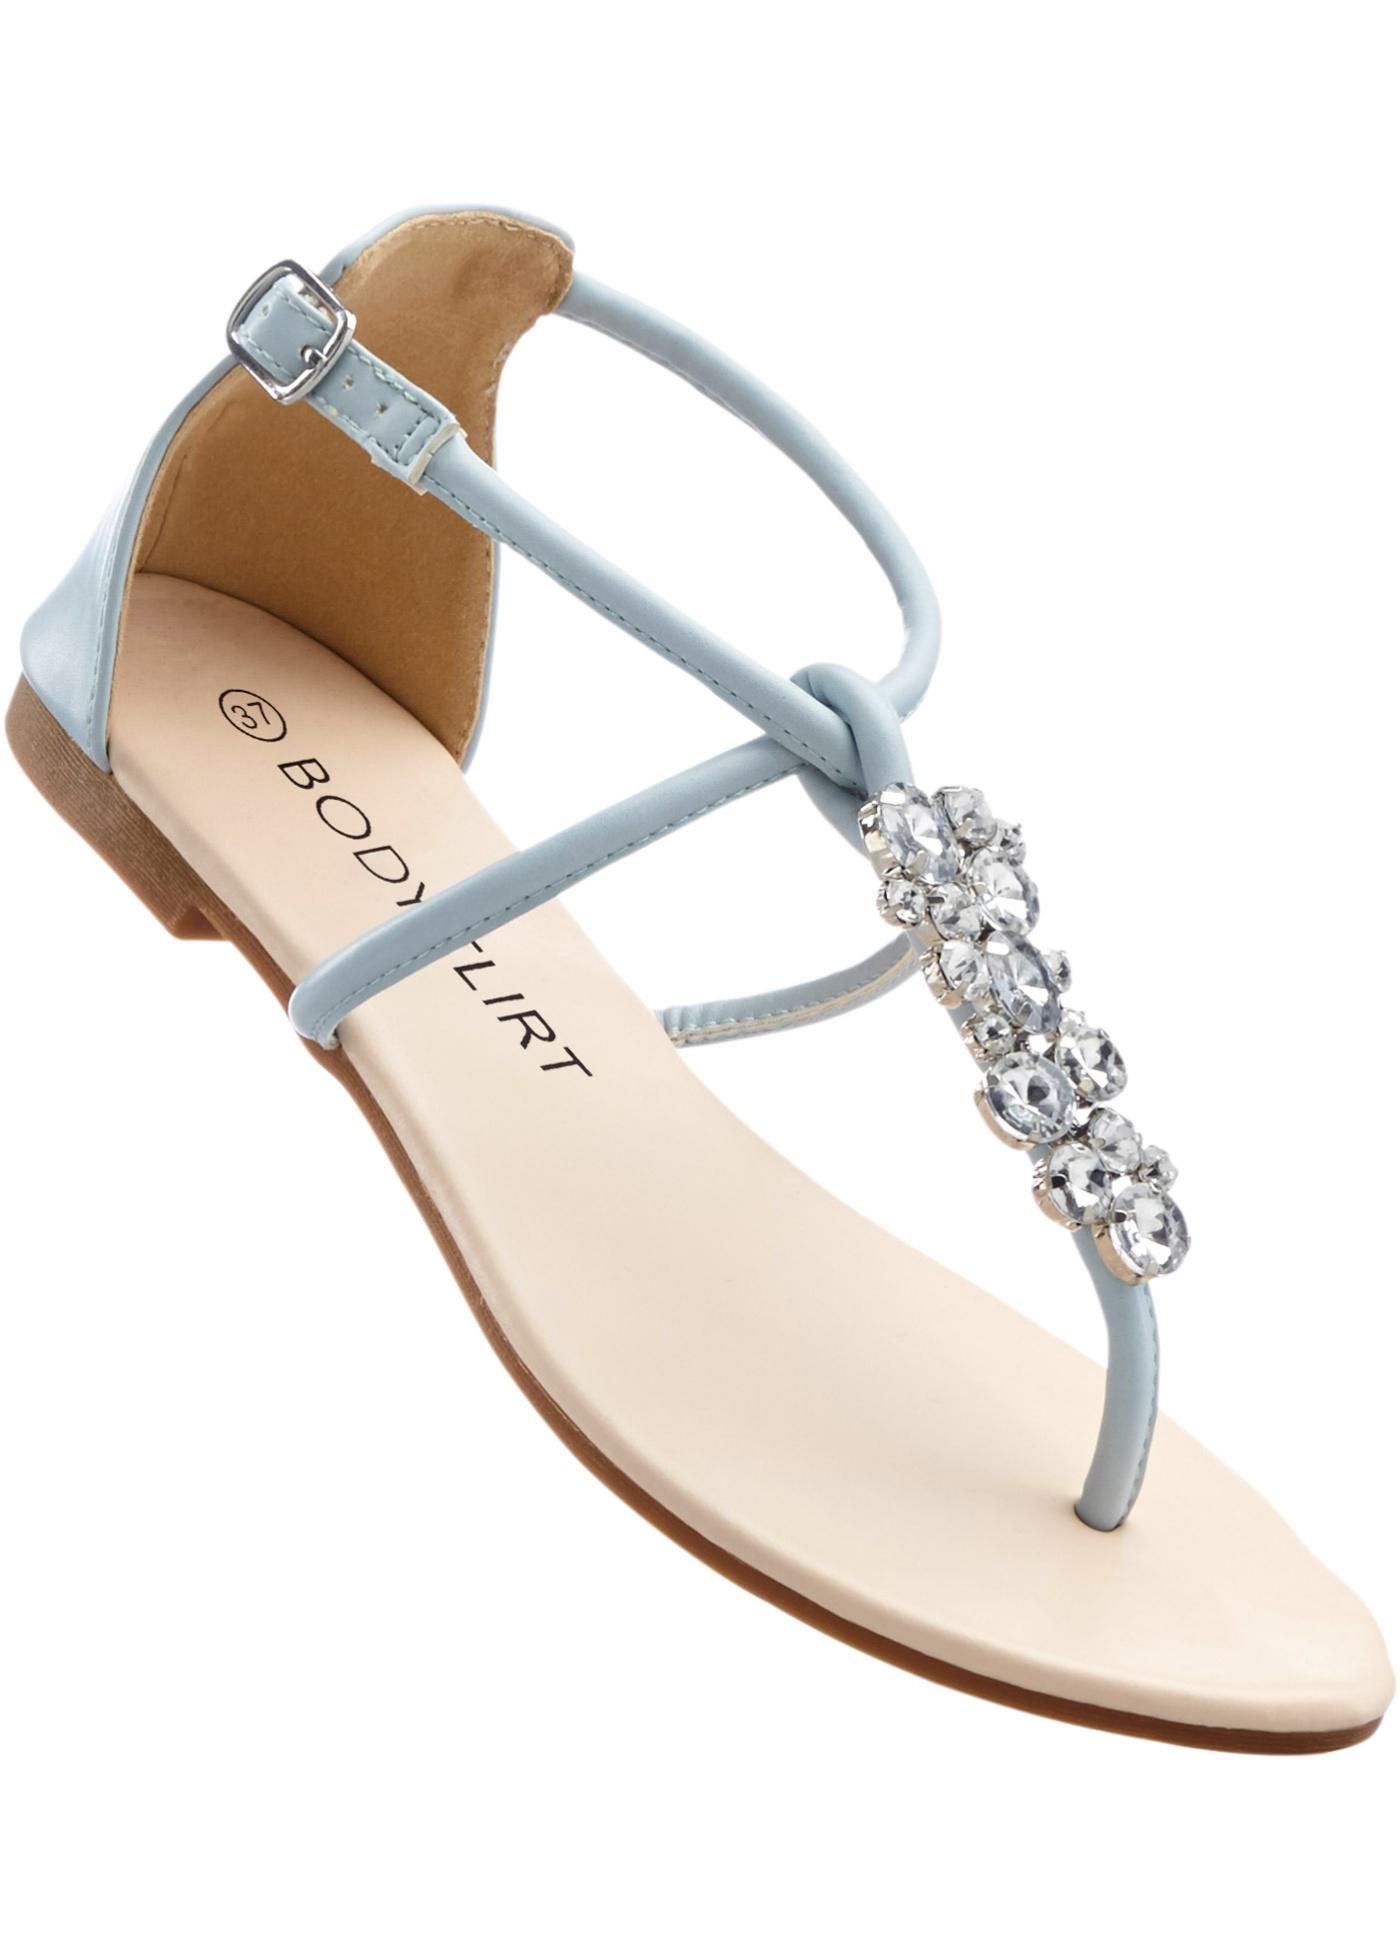 Sandales, BODYFLIRT, bleu clair